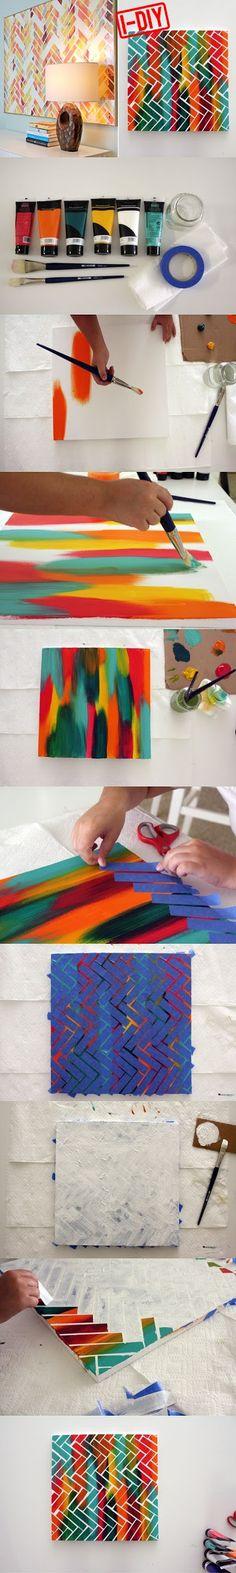 DIY Artwork Project-PAINTERS TAPE ART DIY